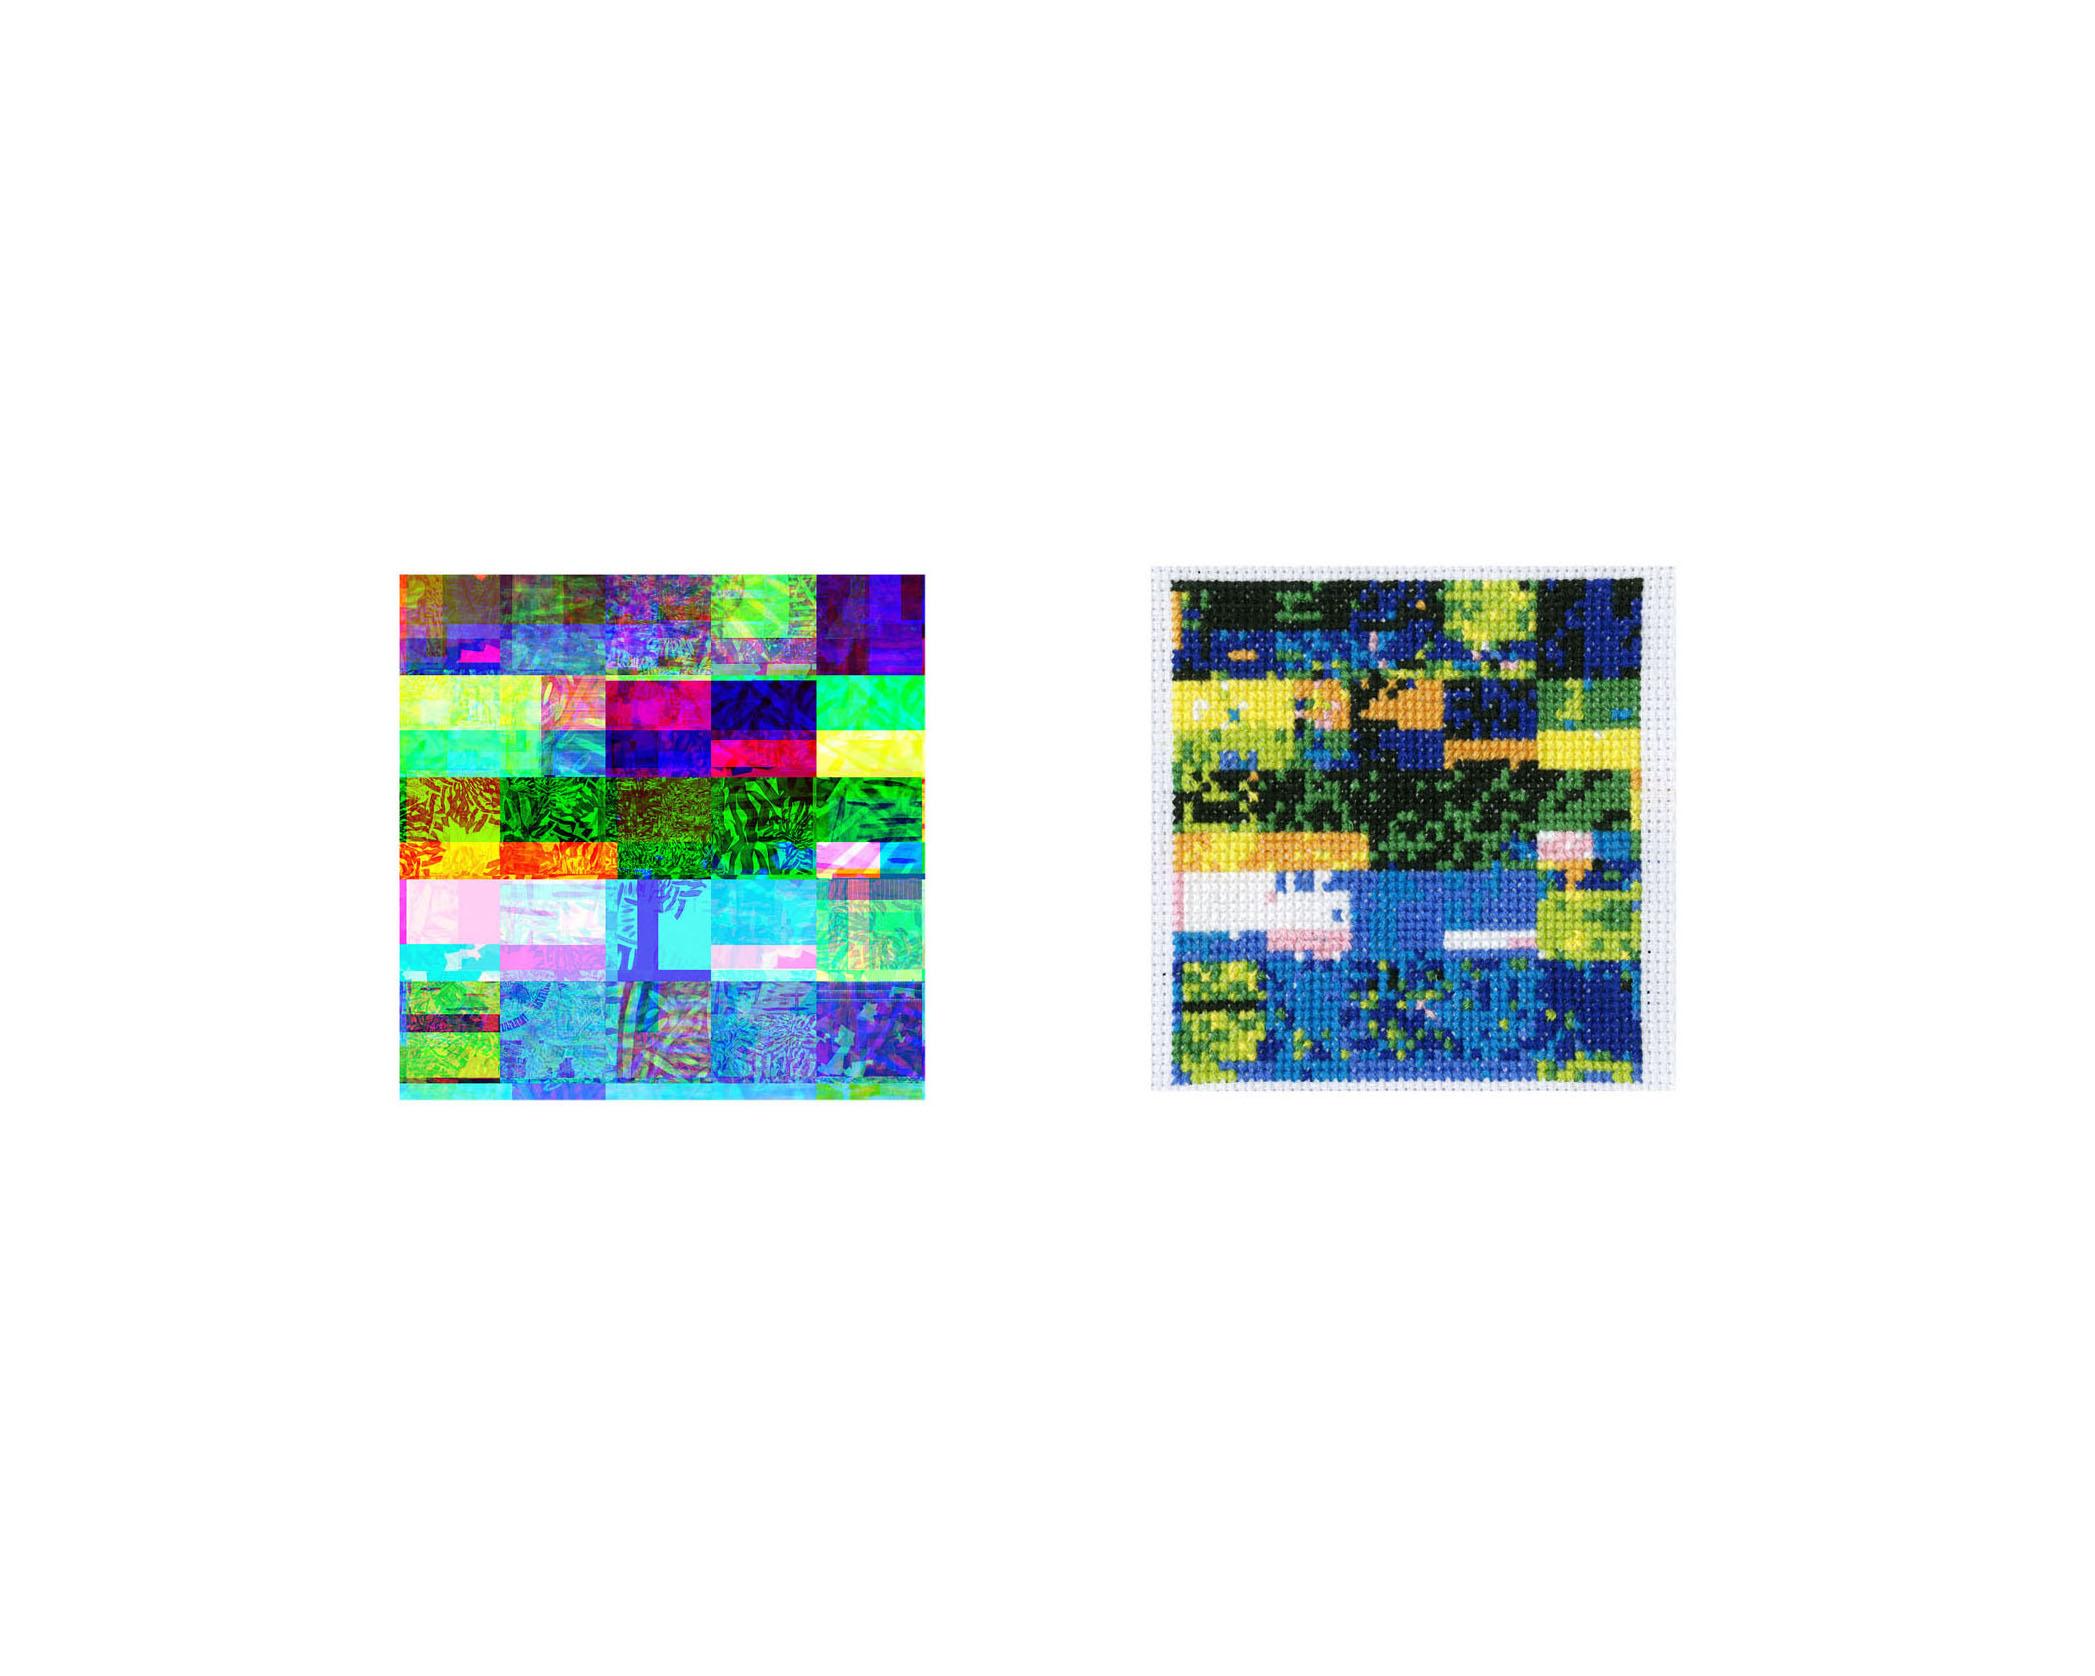 Glitch Series 01 - Crop_5.jpg